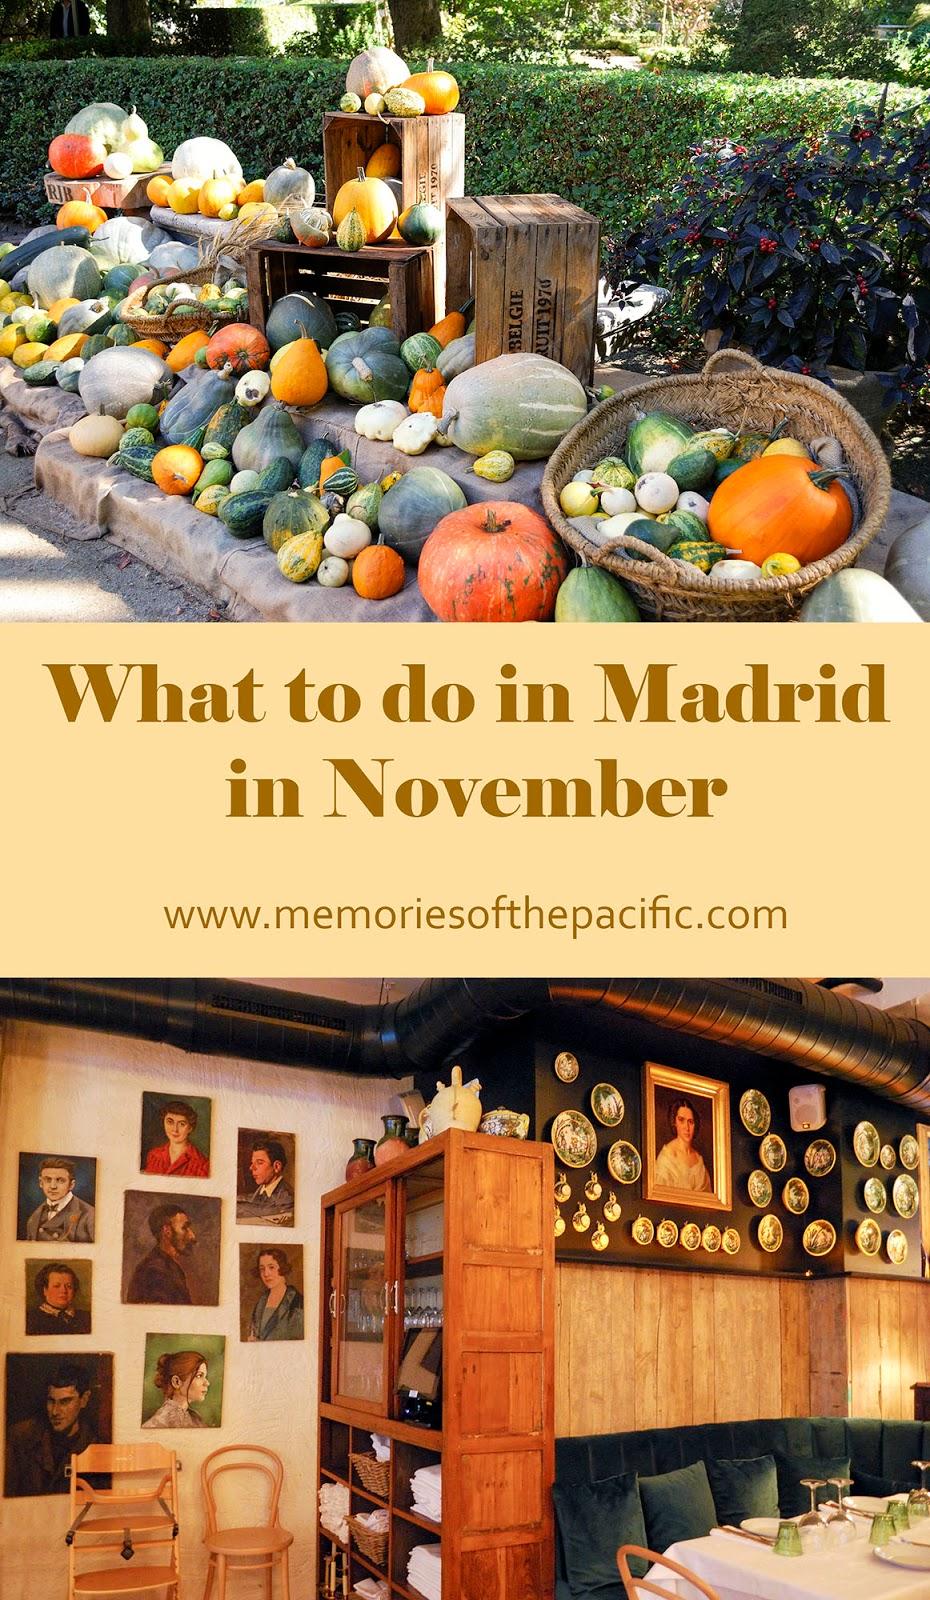 madrid november activities events